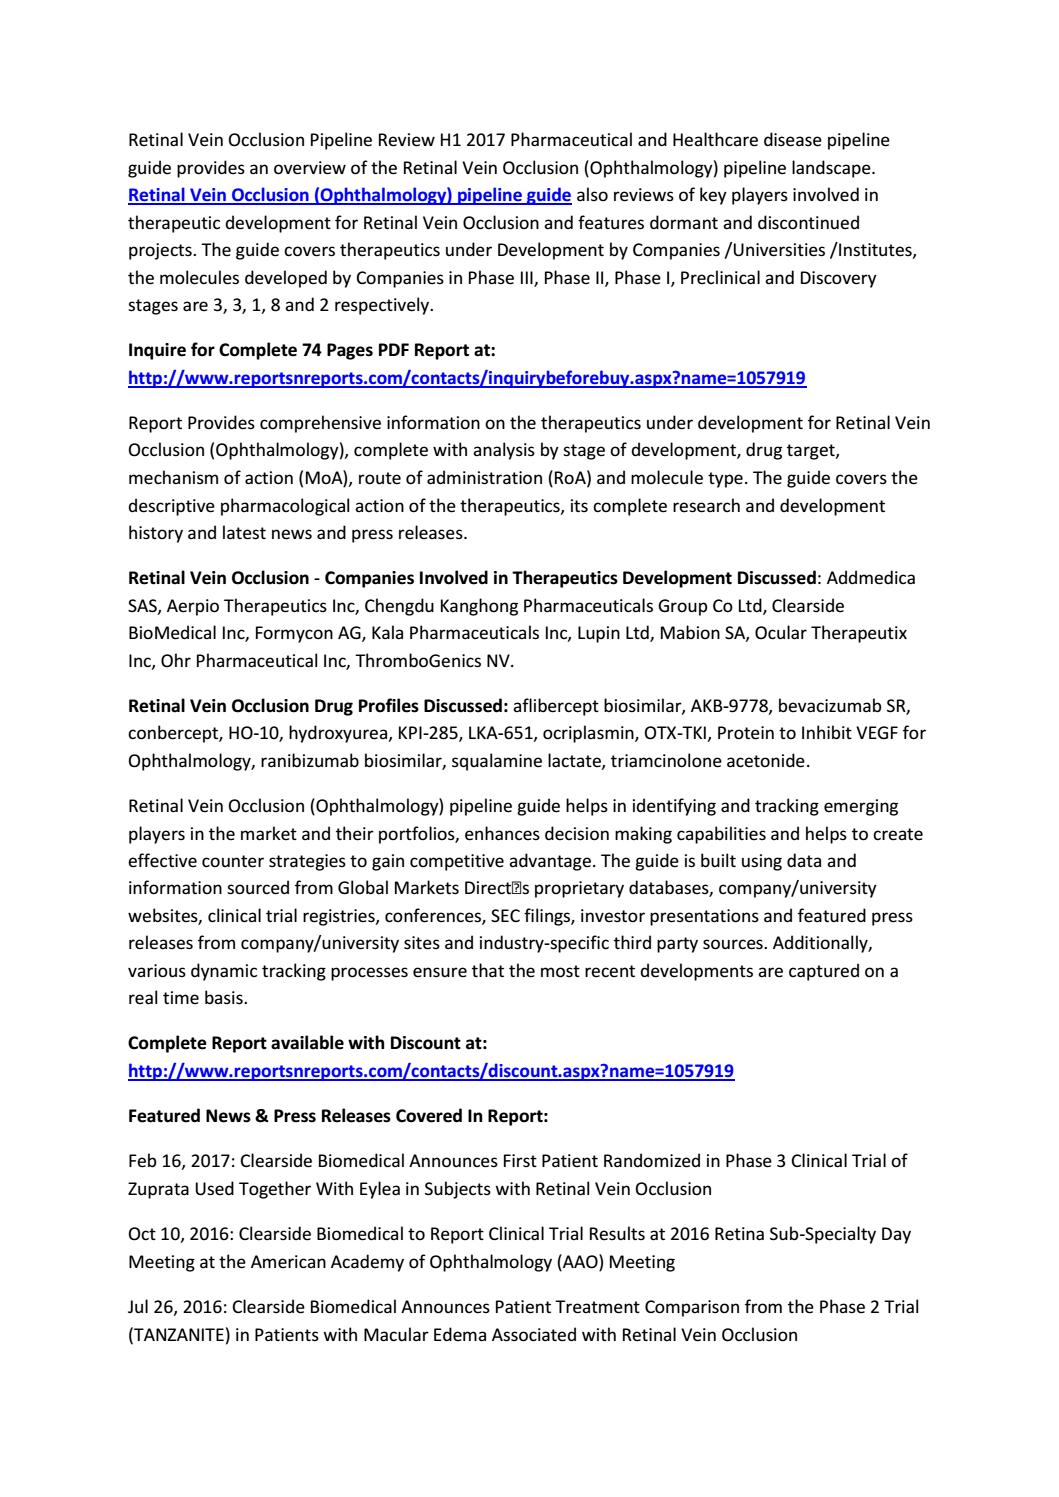 Retinal Vein Occlusion Pipeline Product Development H1 2017